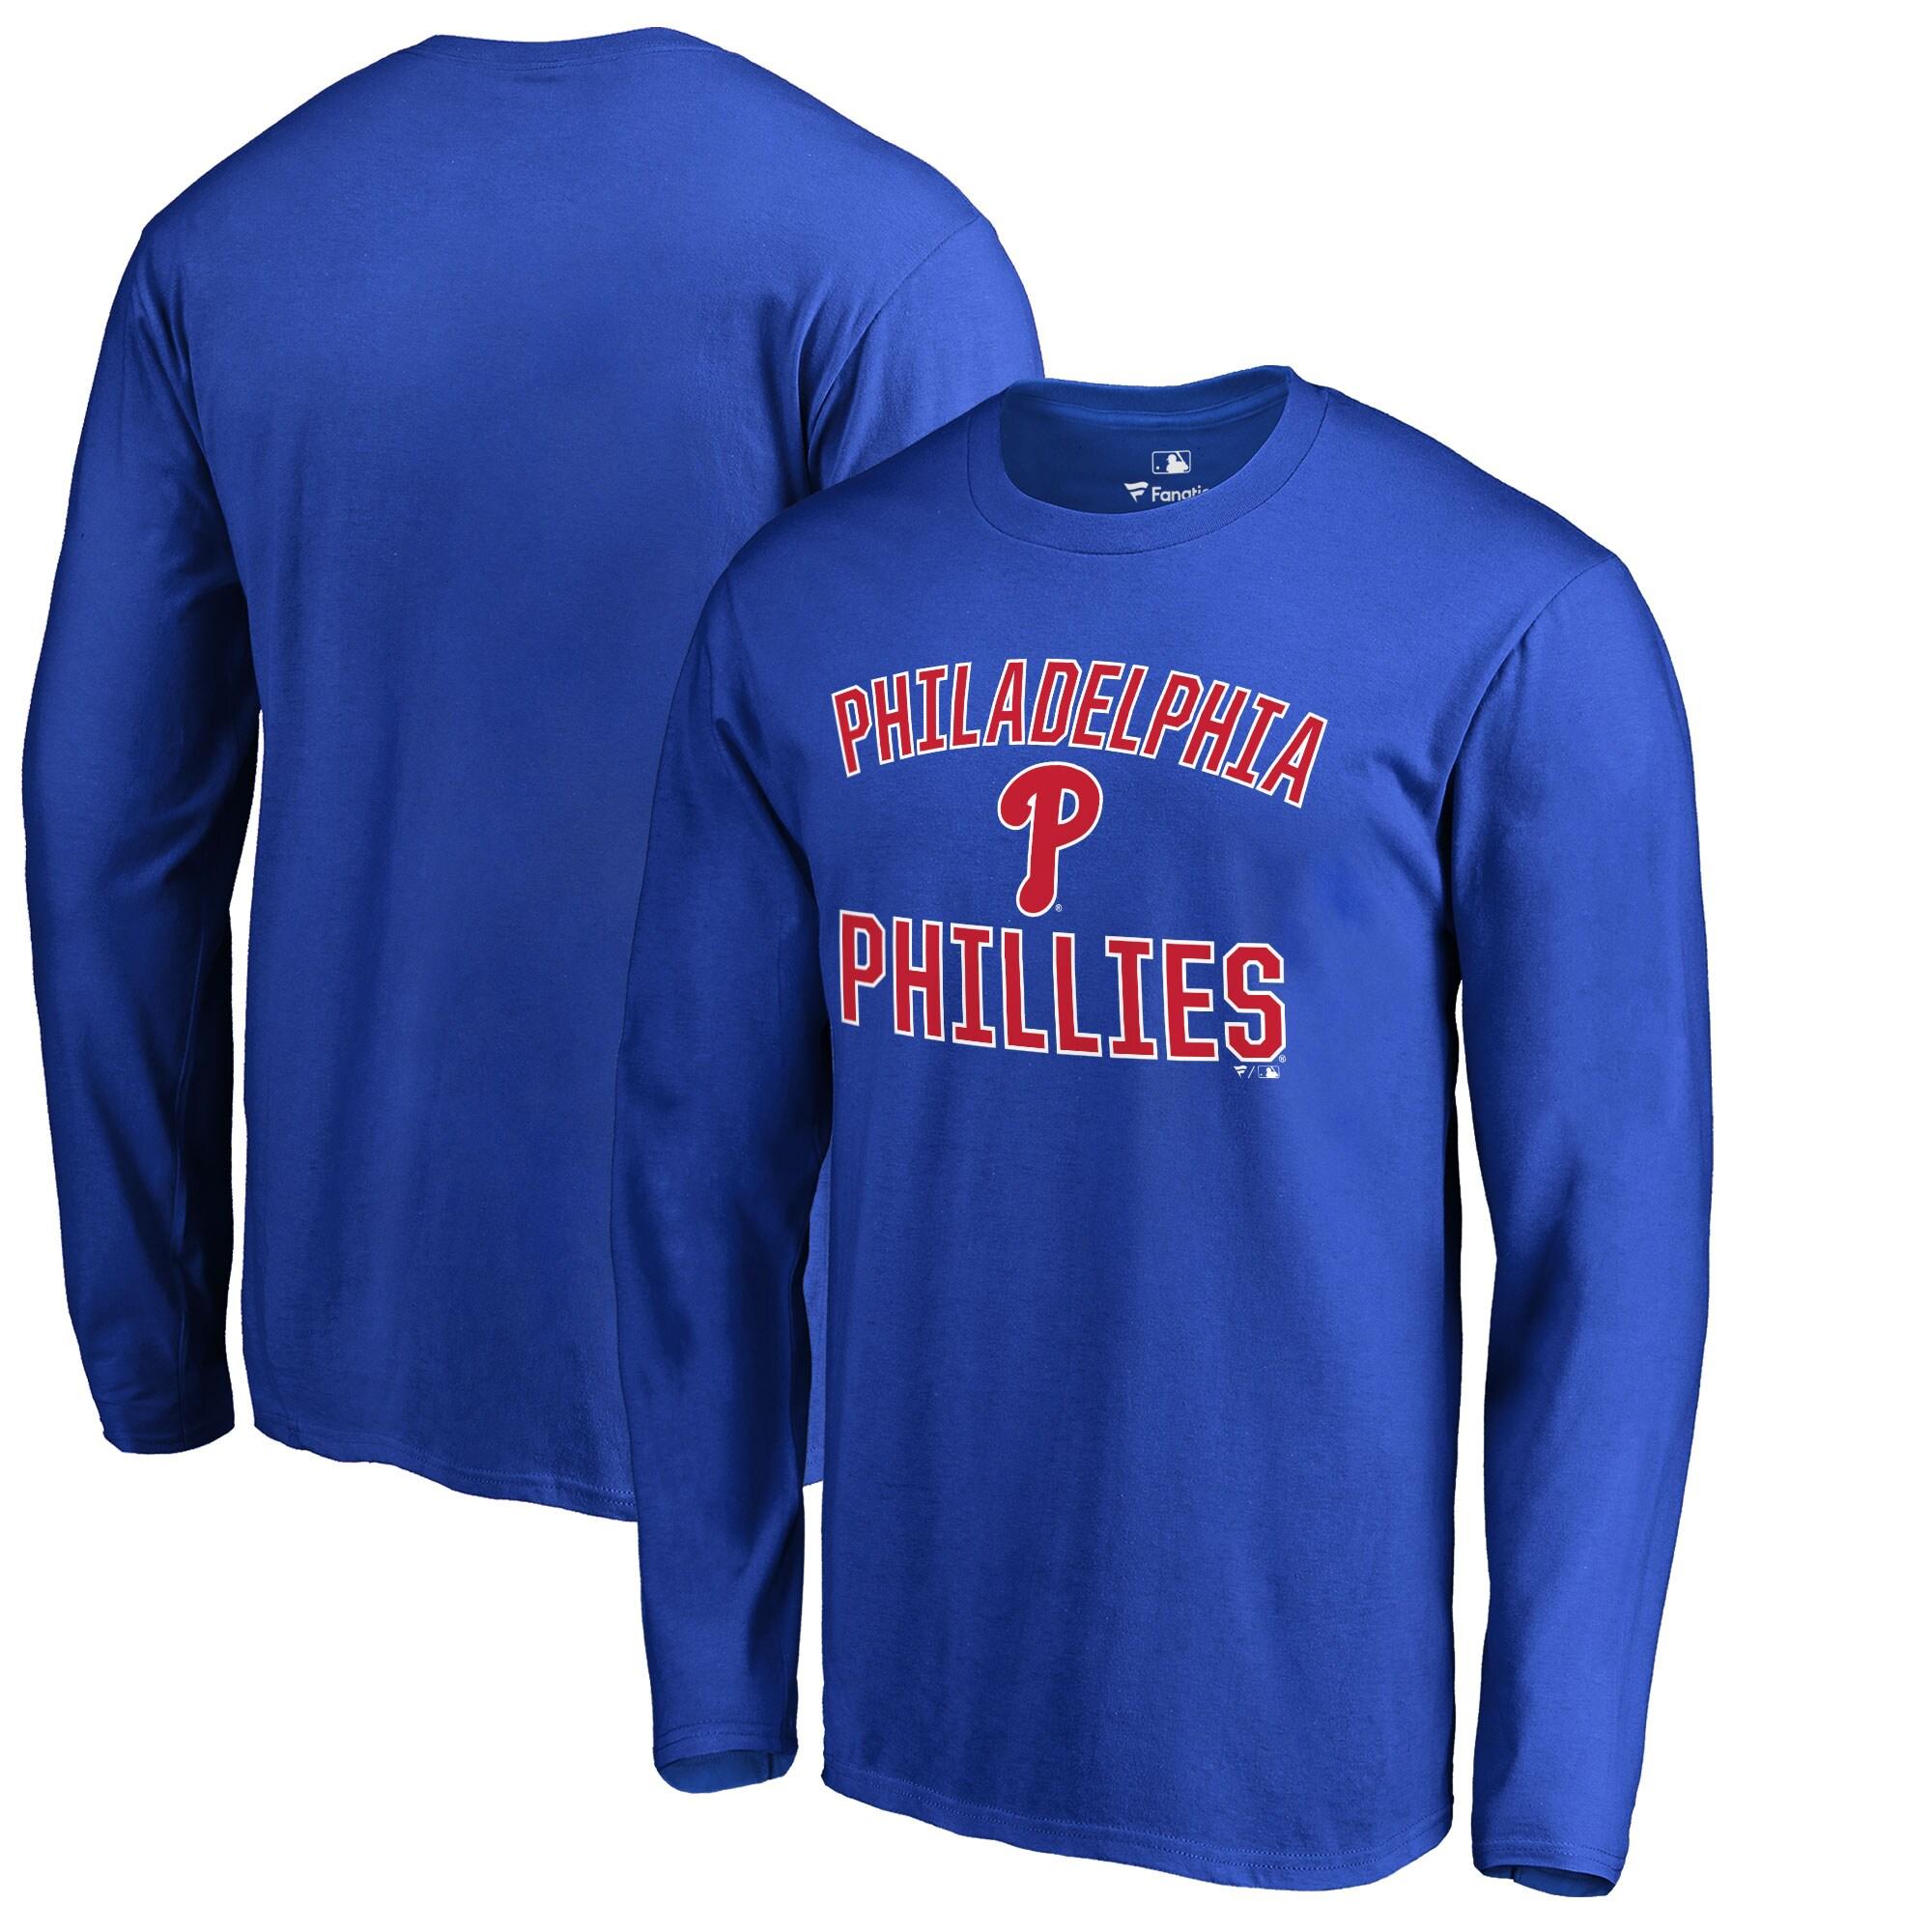 Philadelphia Phillies Victory Arch Long Sleeve T-Shirt - Royal